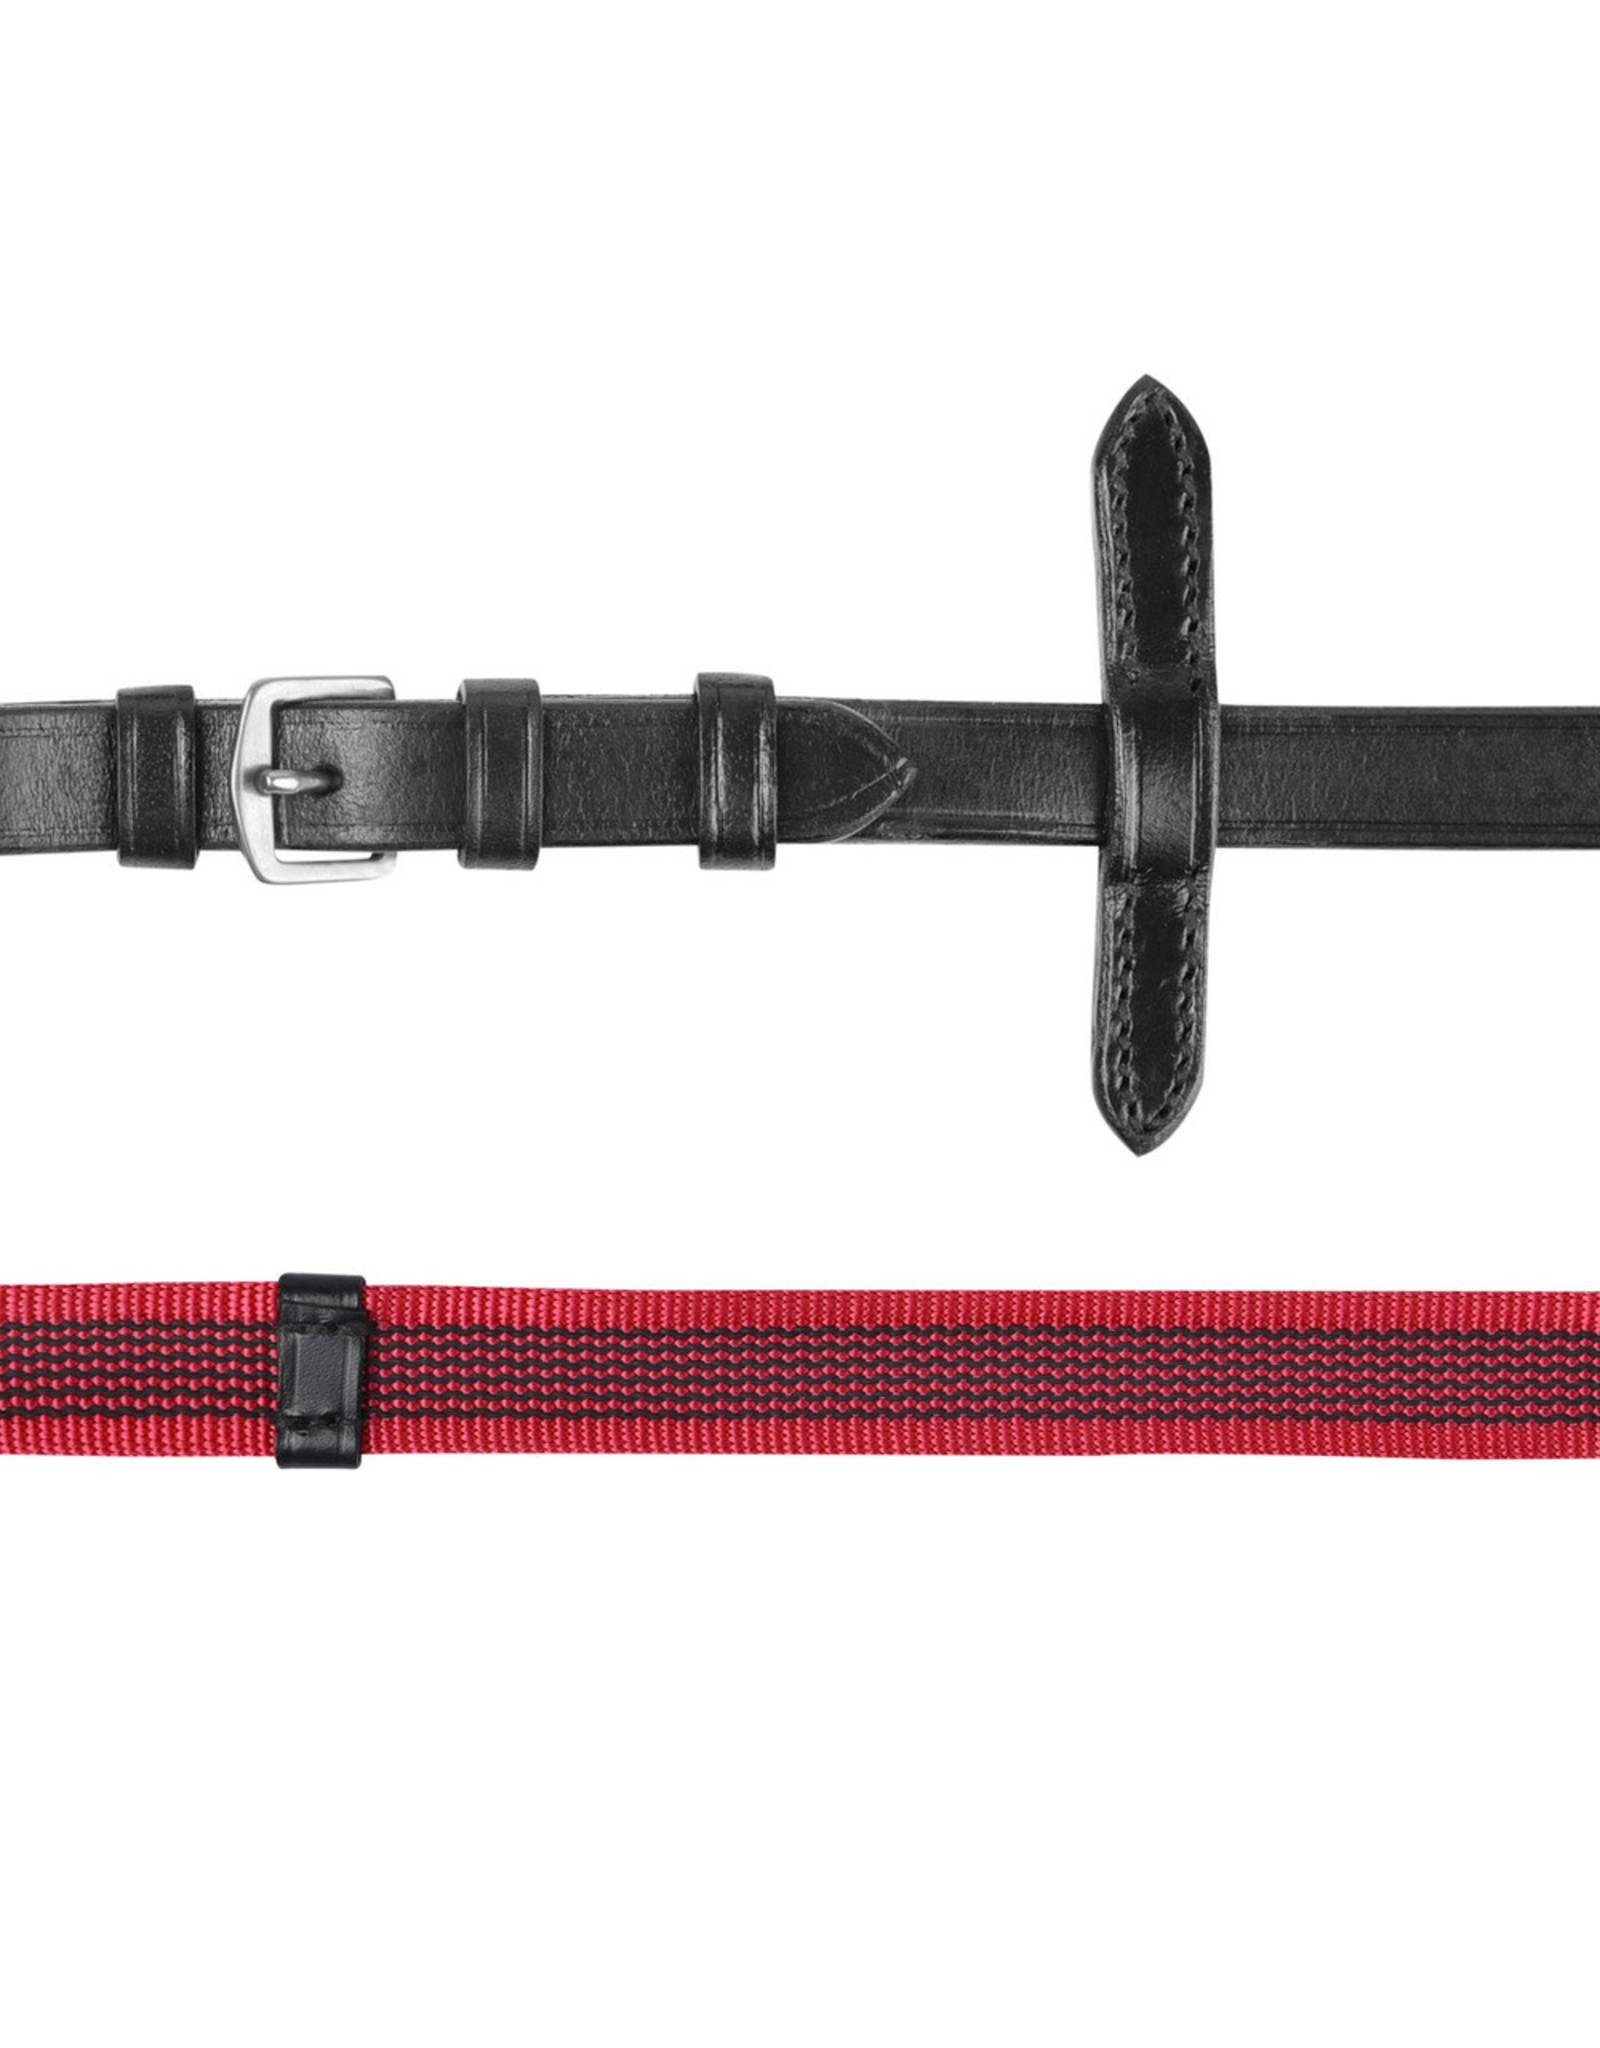 WALDHAUSEN X-Line Coloured Anti-Slip Reins